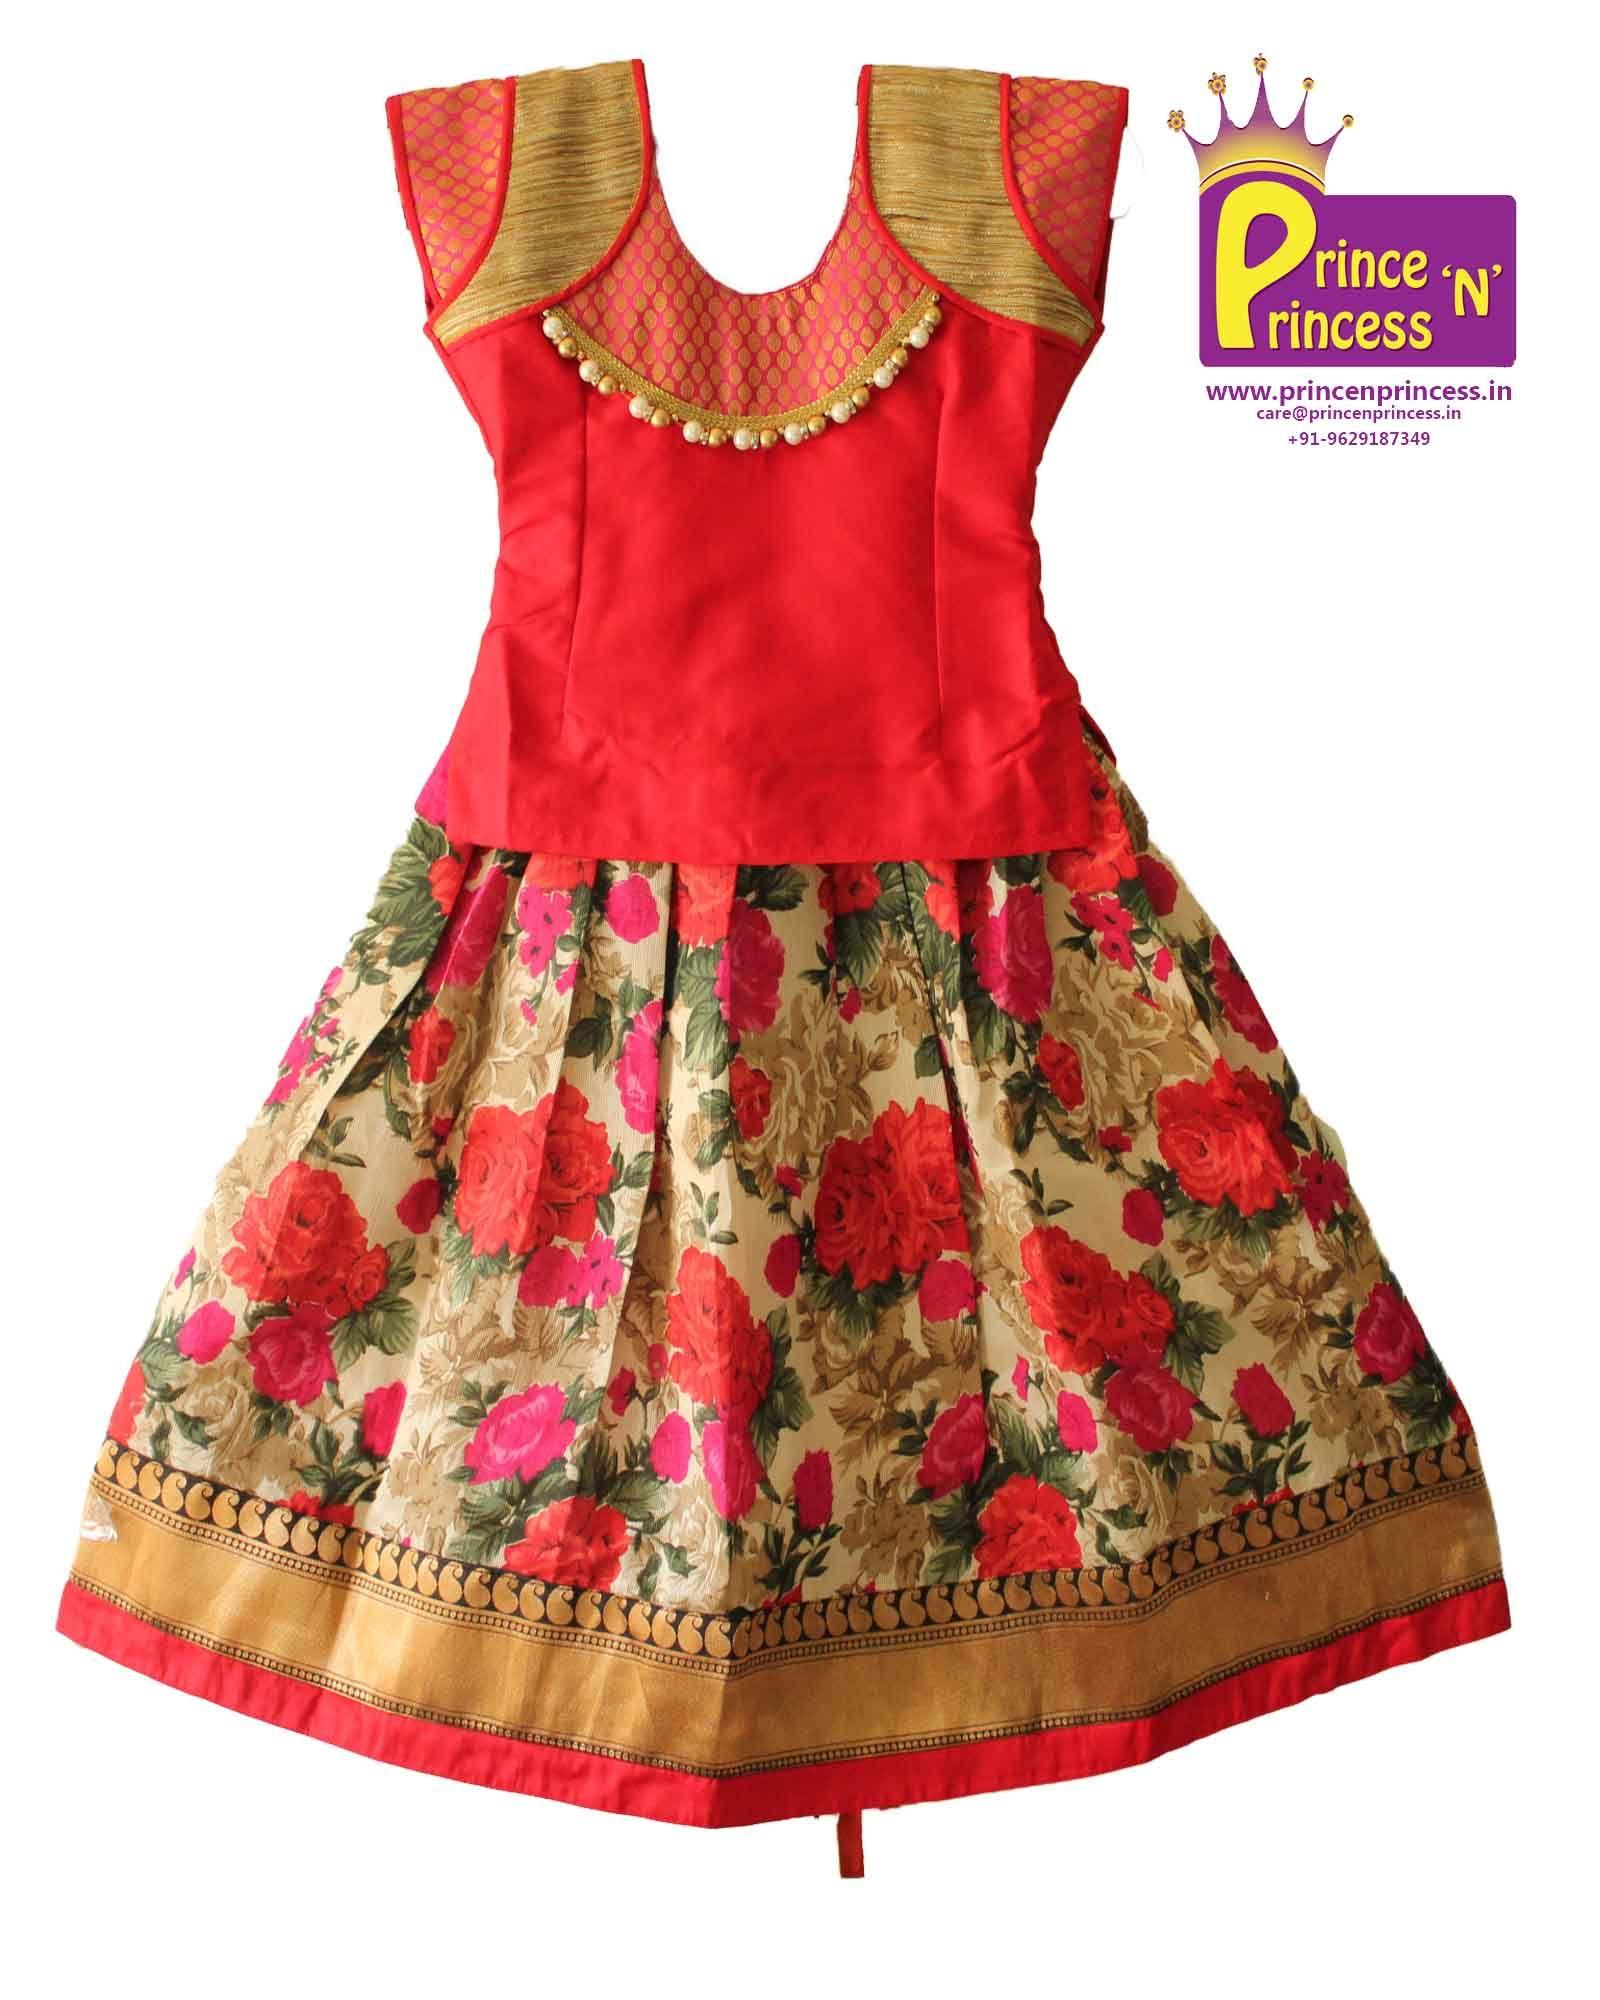 Saree blouse design pattu buy cute floral design pavadai sattai langa  beautiful skirt